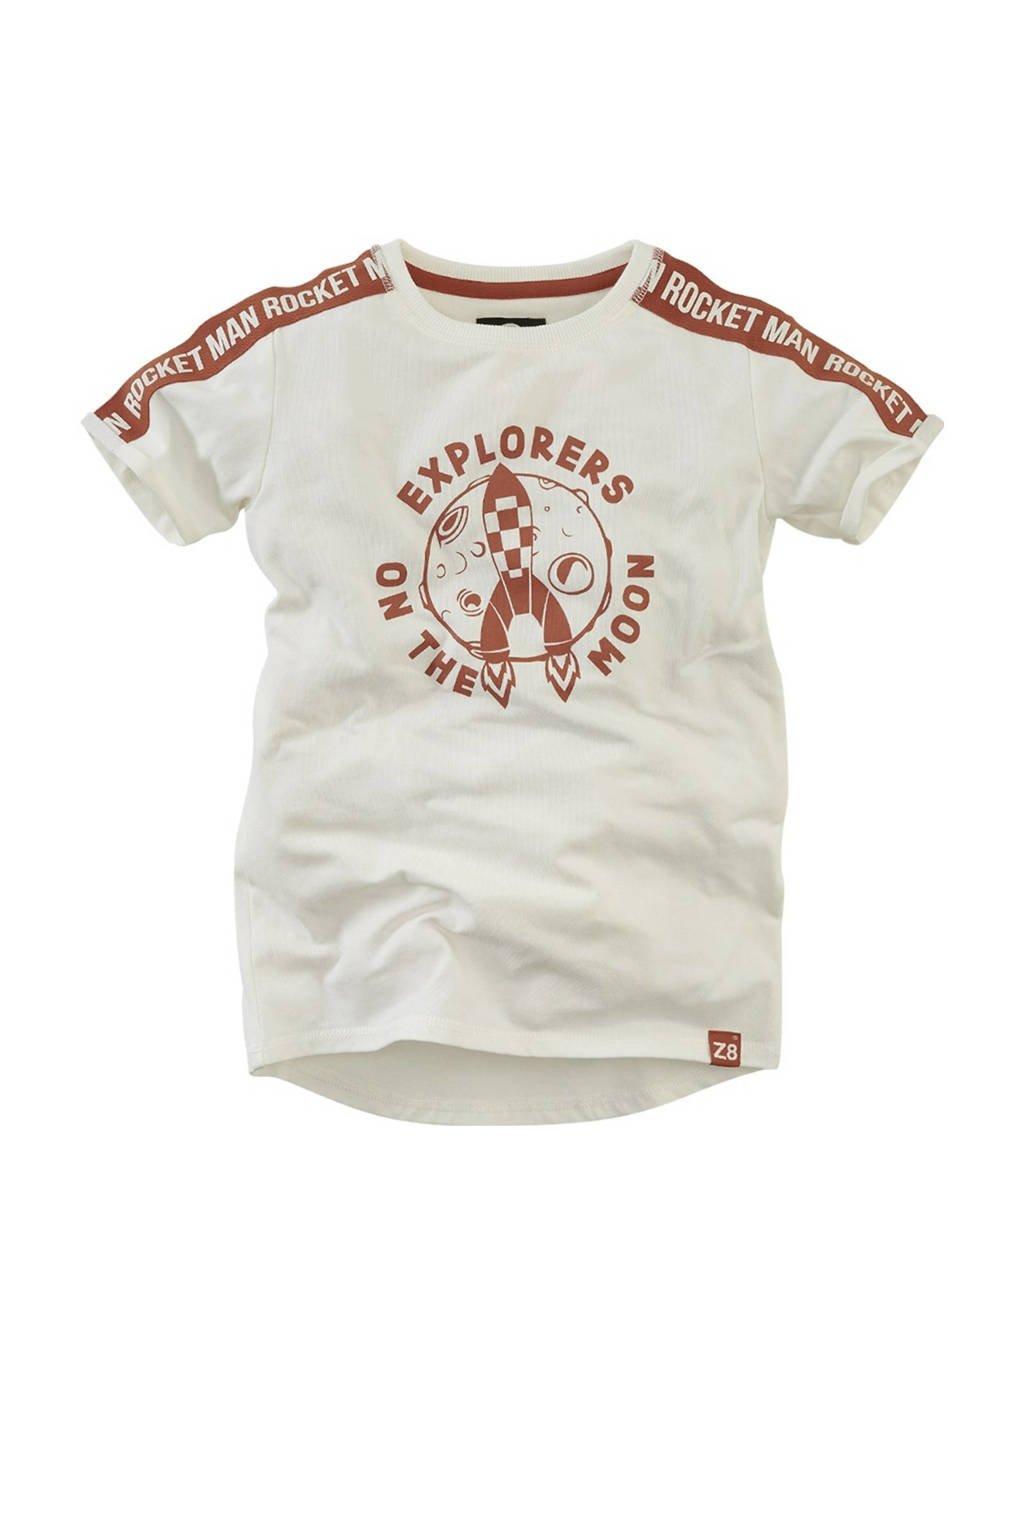 Z8 T-shirt Vincent met printopdruk ecru, Ecru